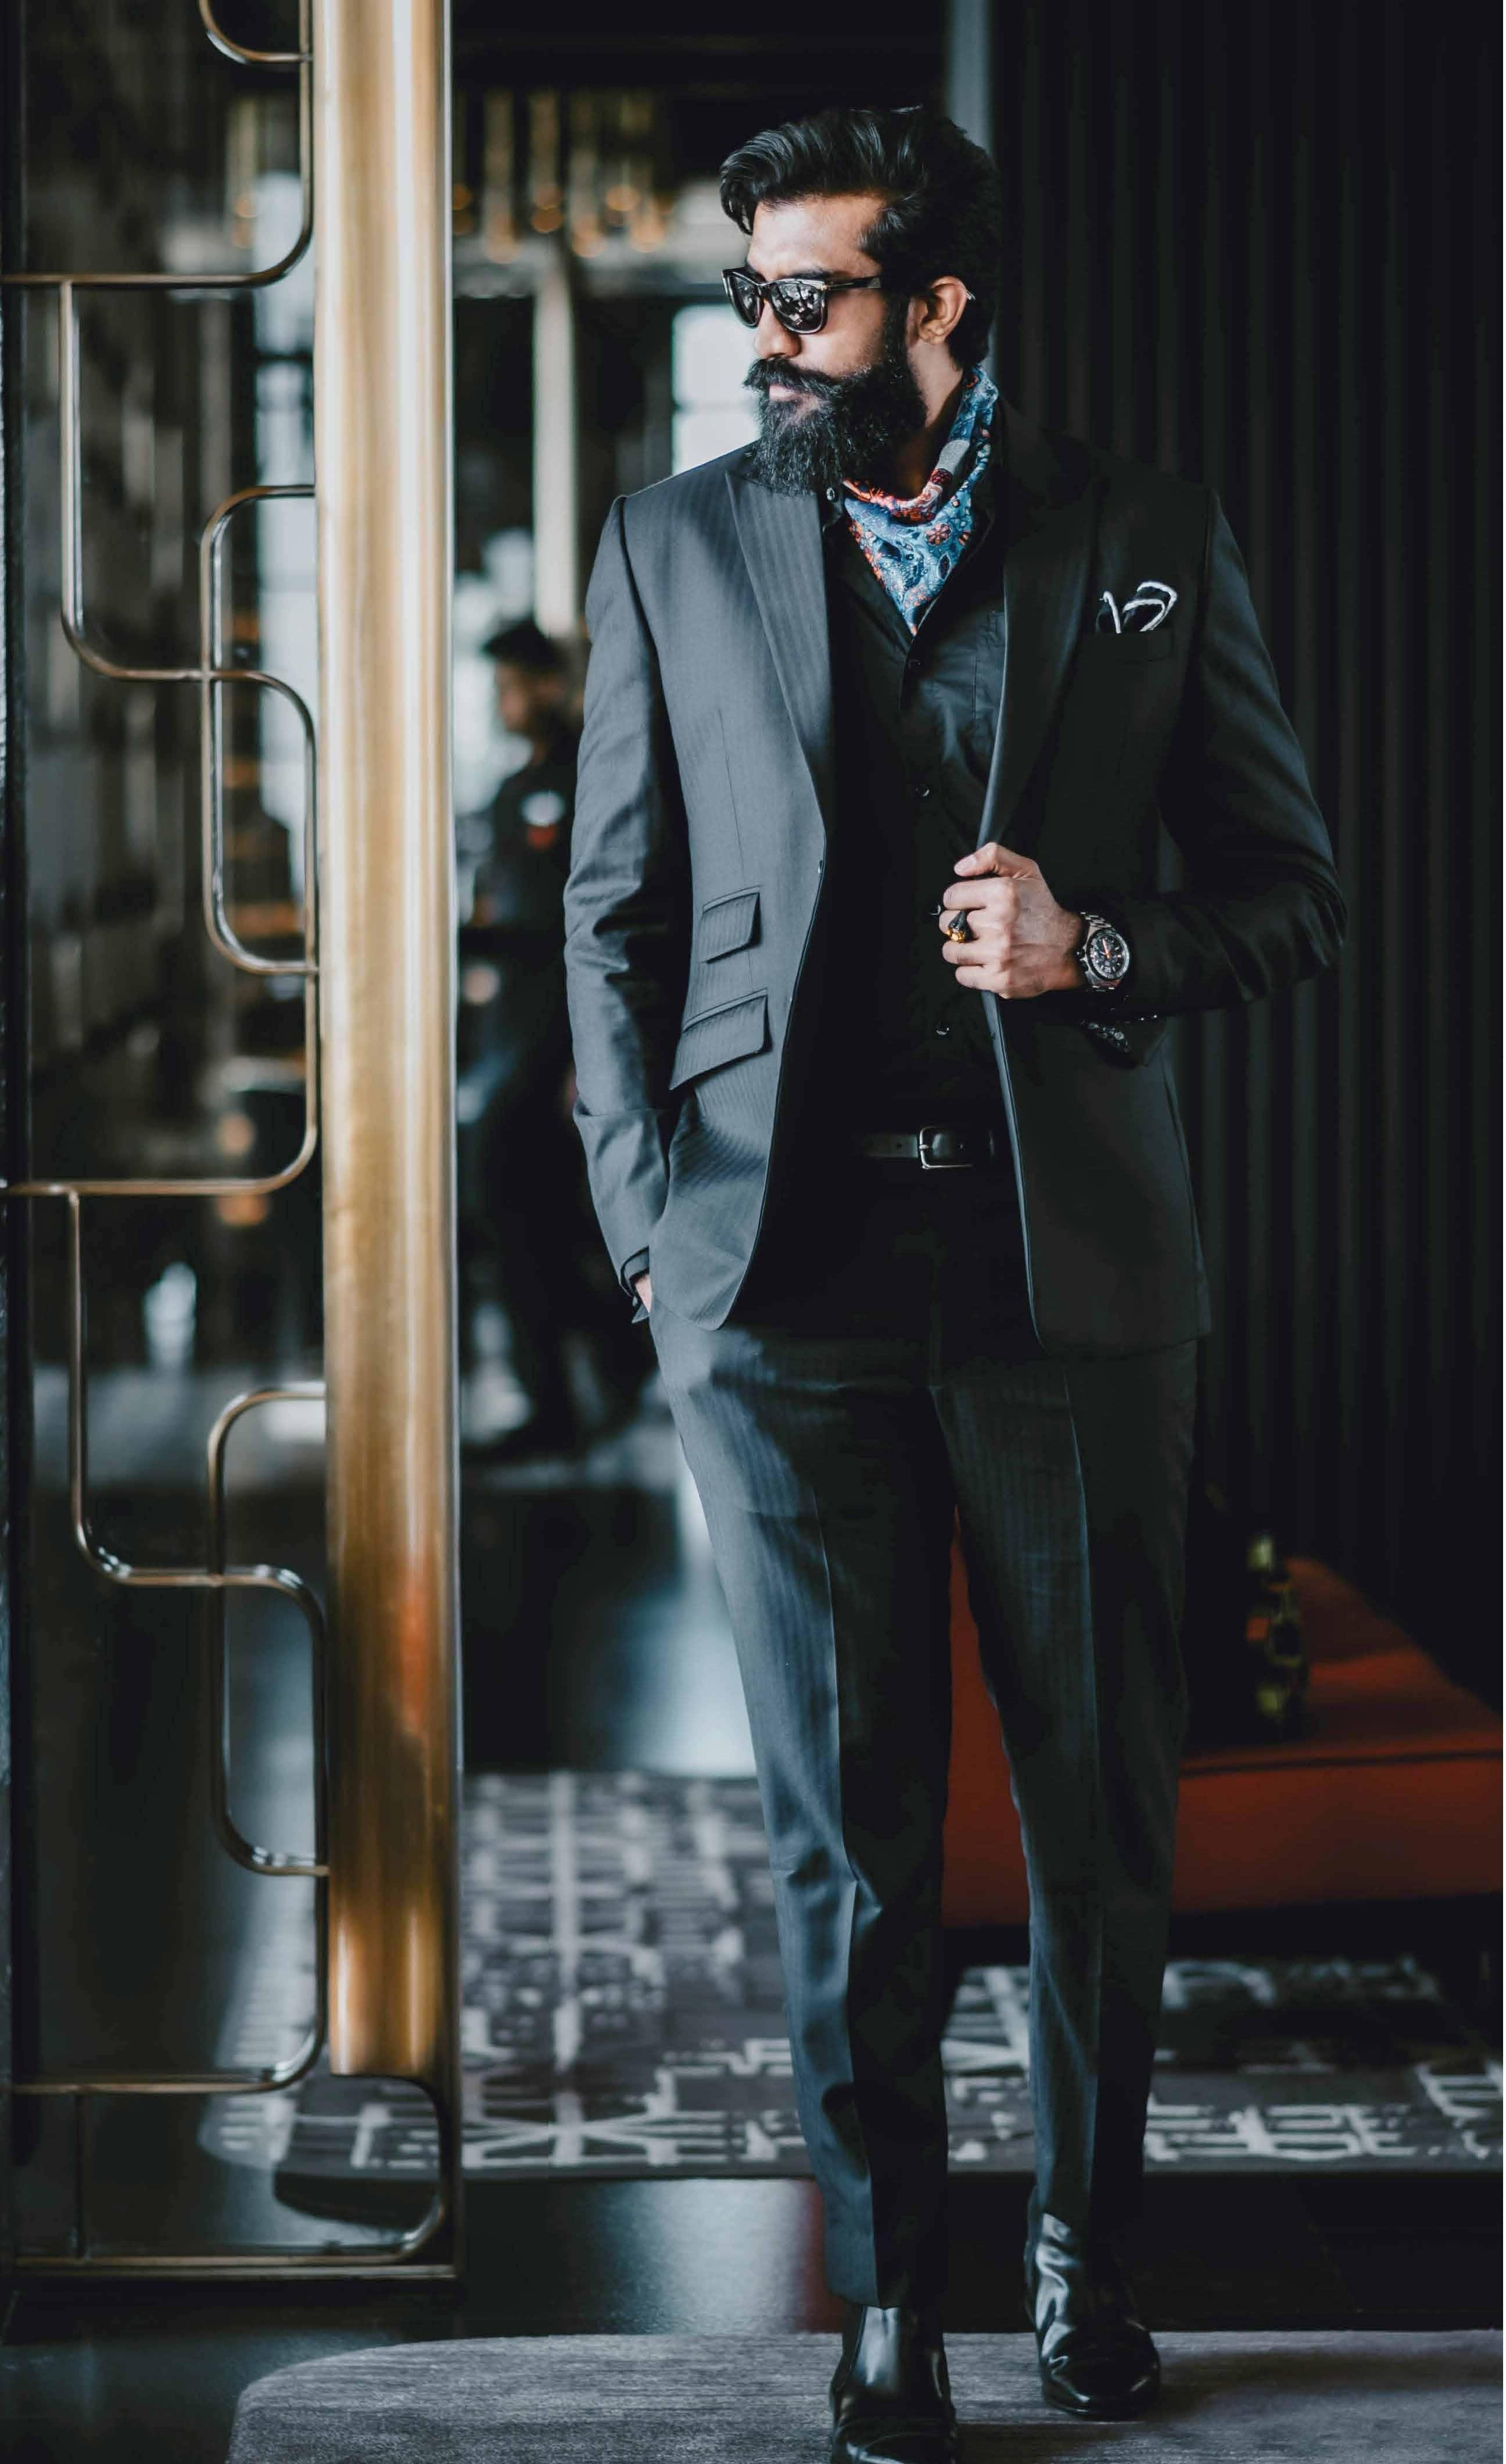 JAZWIN JAAF: Public Figure & Purveyor of the Gentlemanly Lifestyle